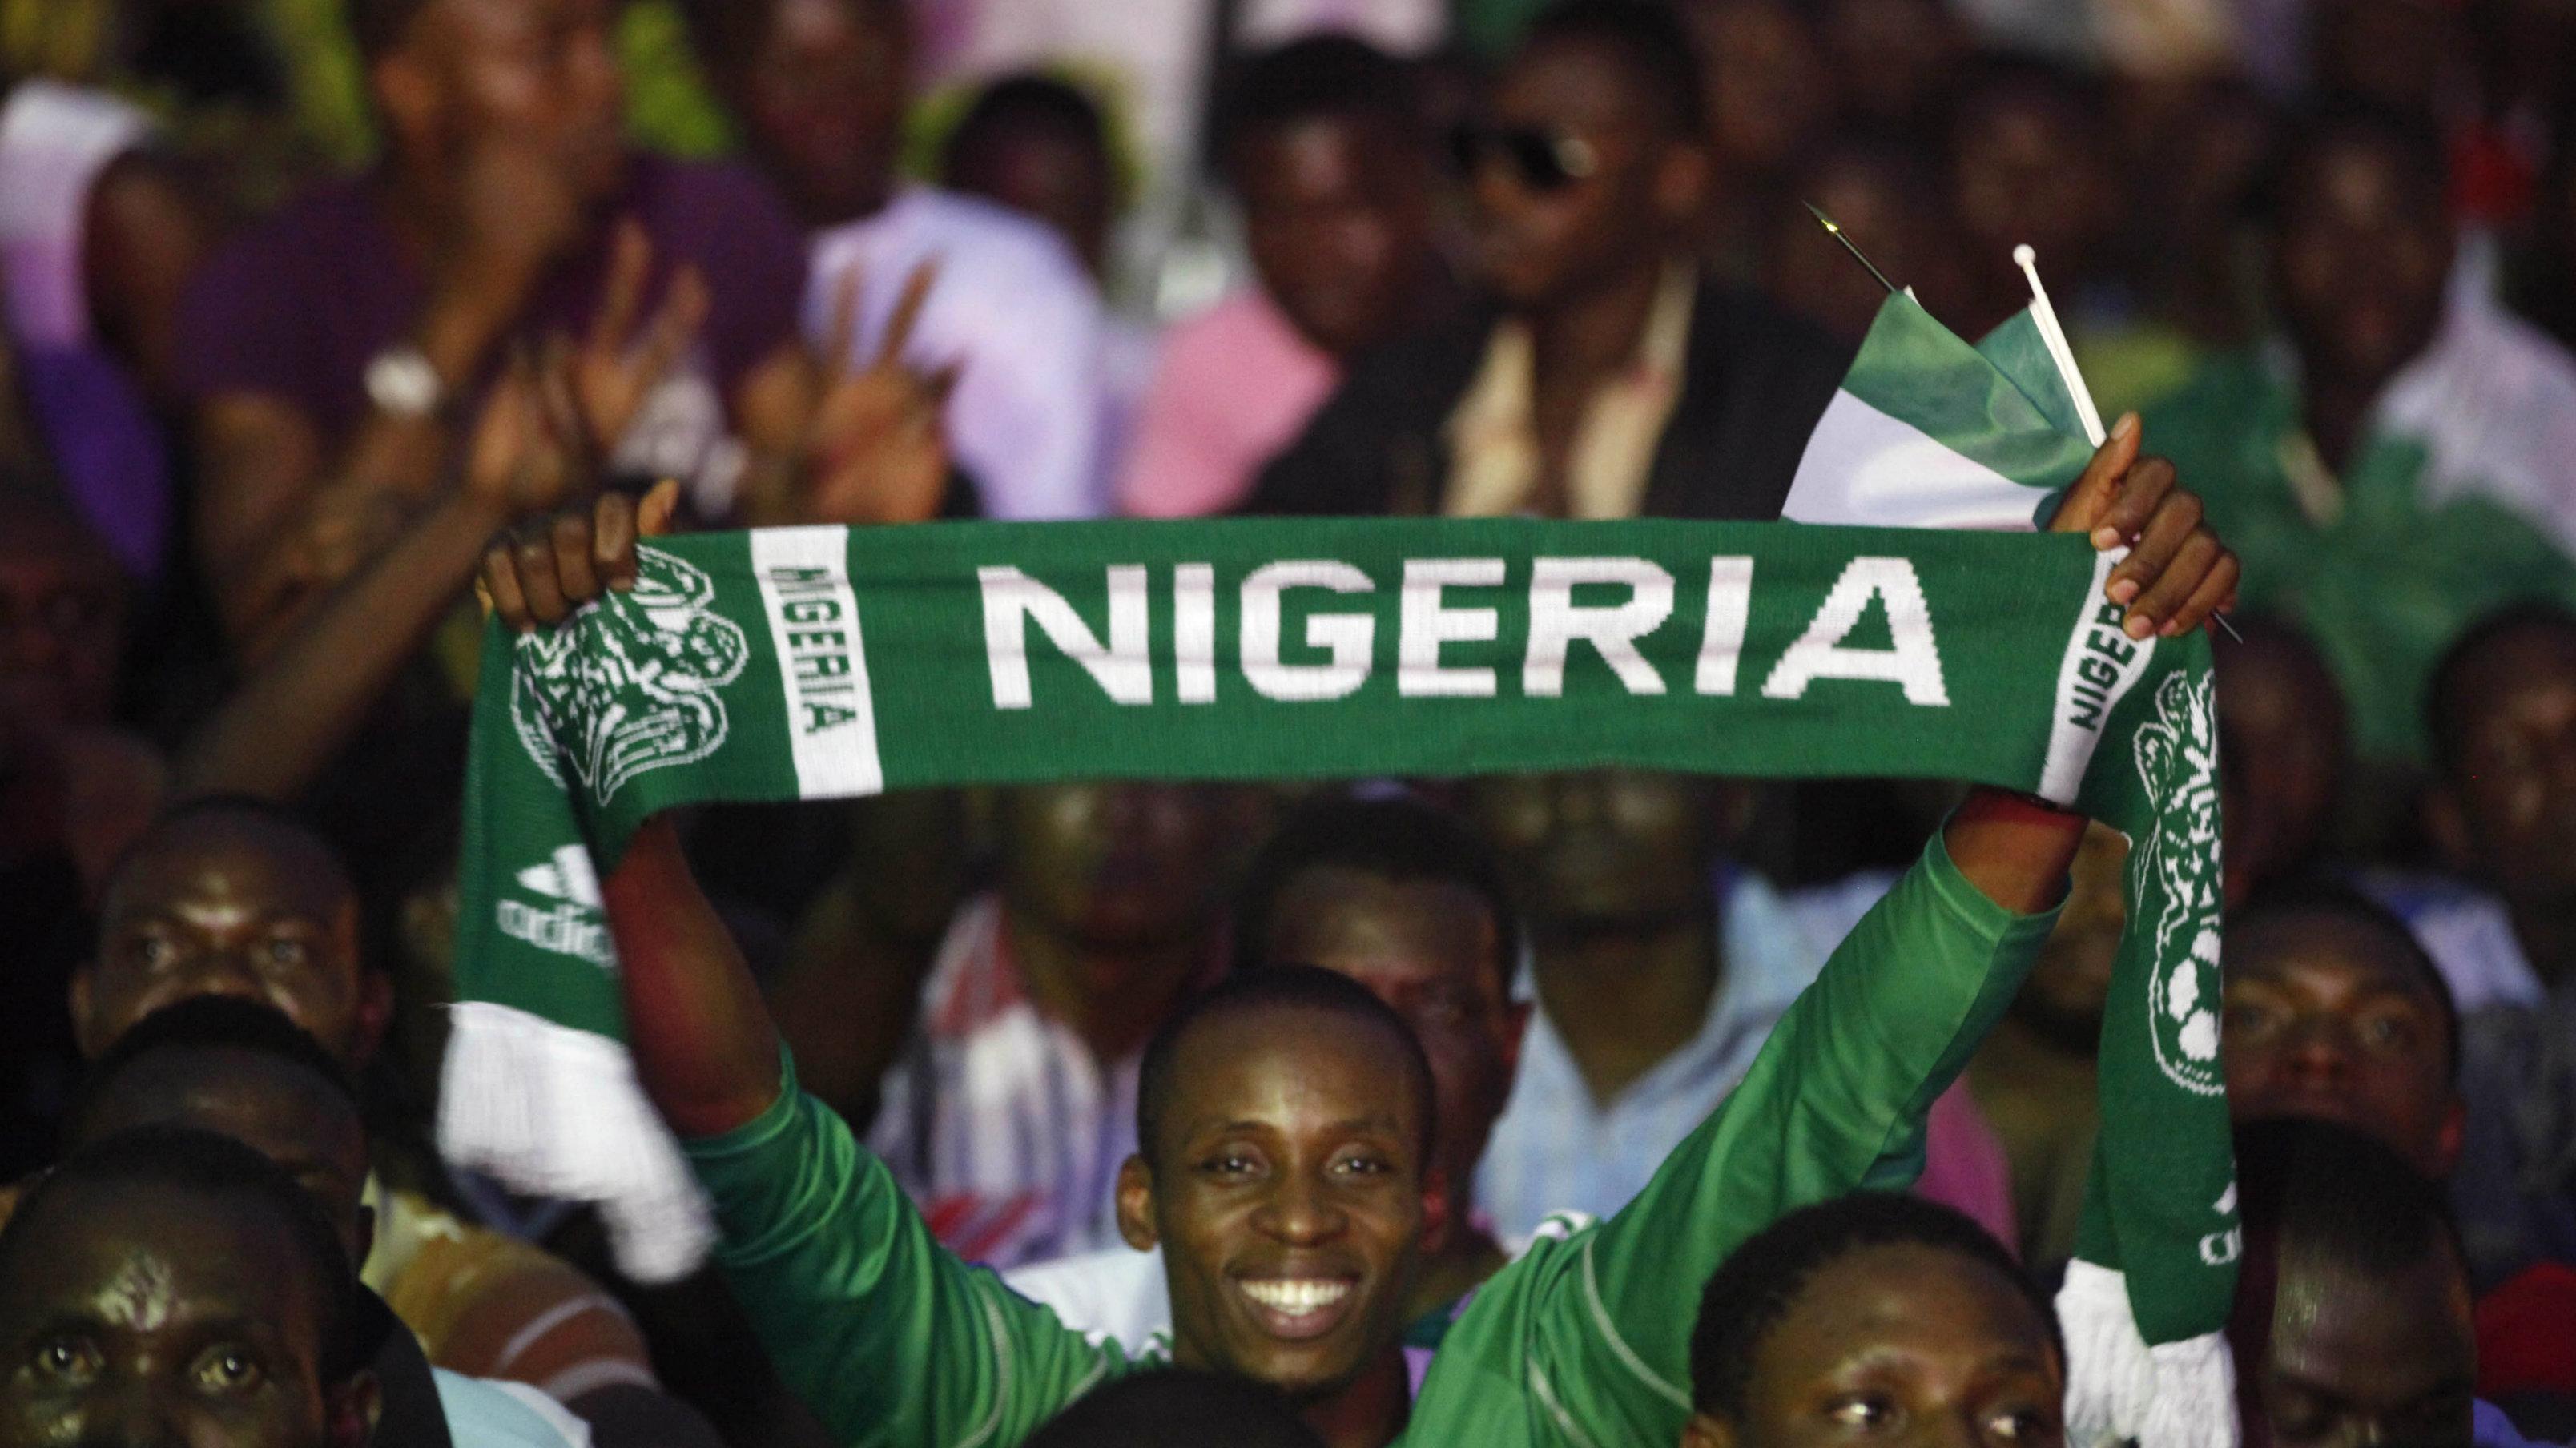 Nigeria match making